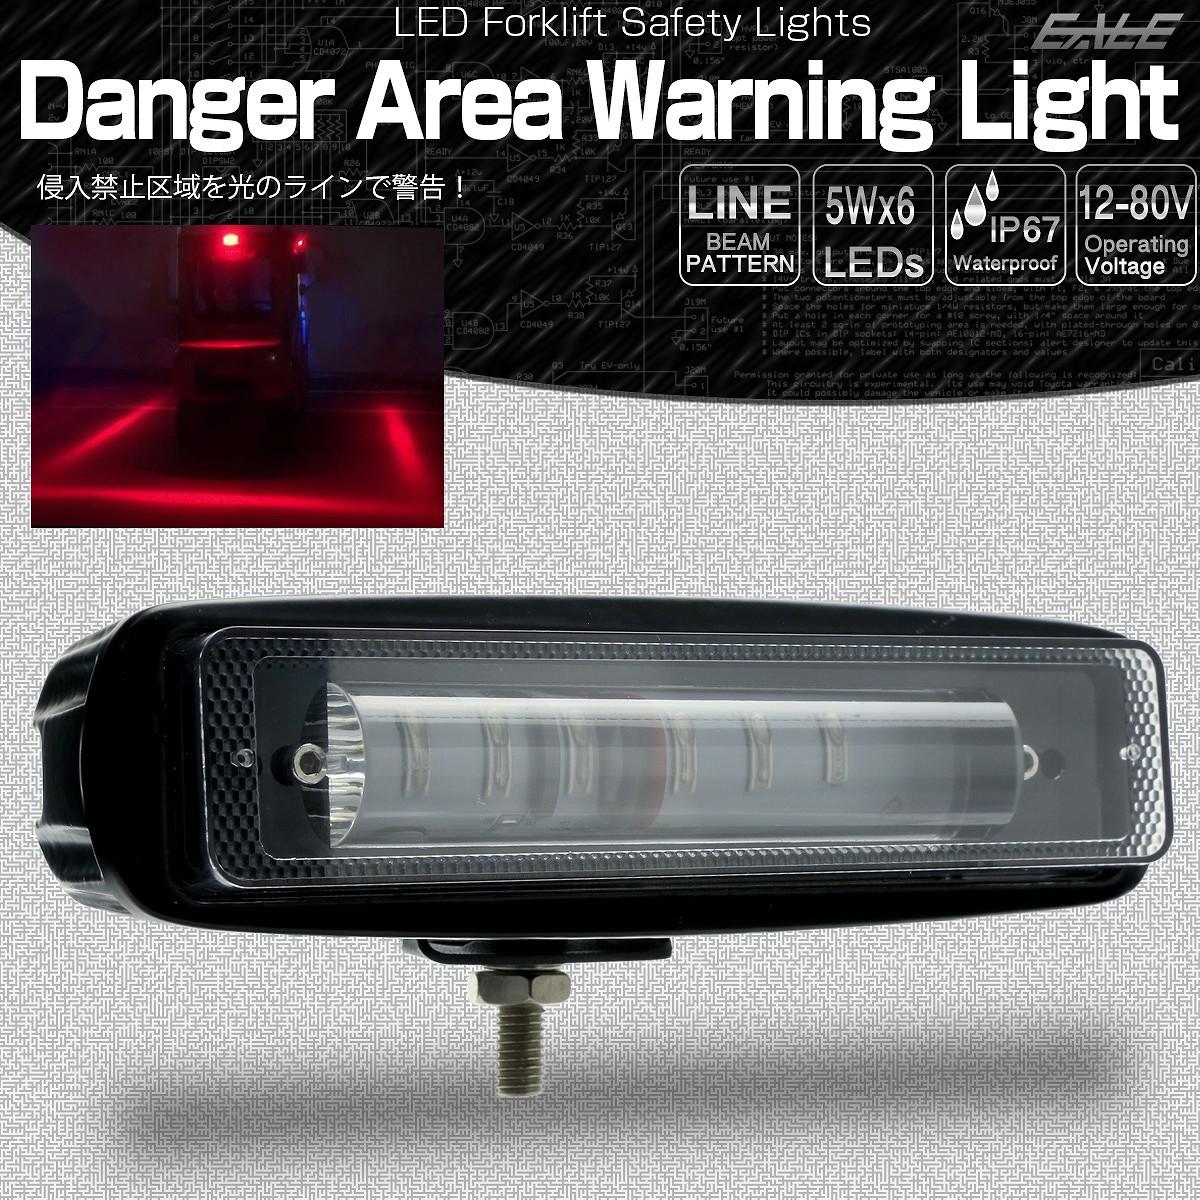 LED 警告灯 レッド ゾーン ビームライト フォークリフト レッカー車 重機  DC12-80V 進入禁止区域 P-453